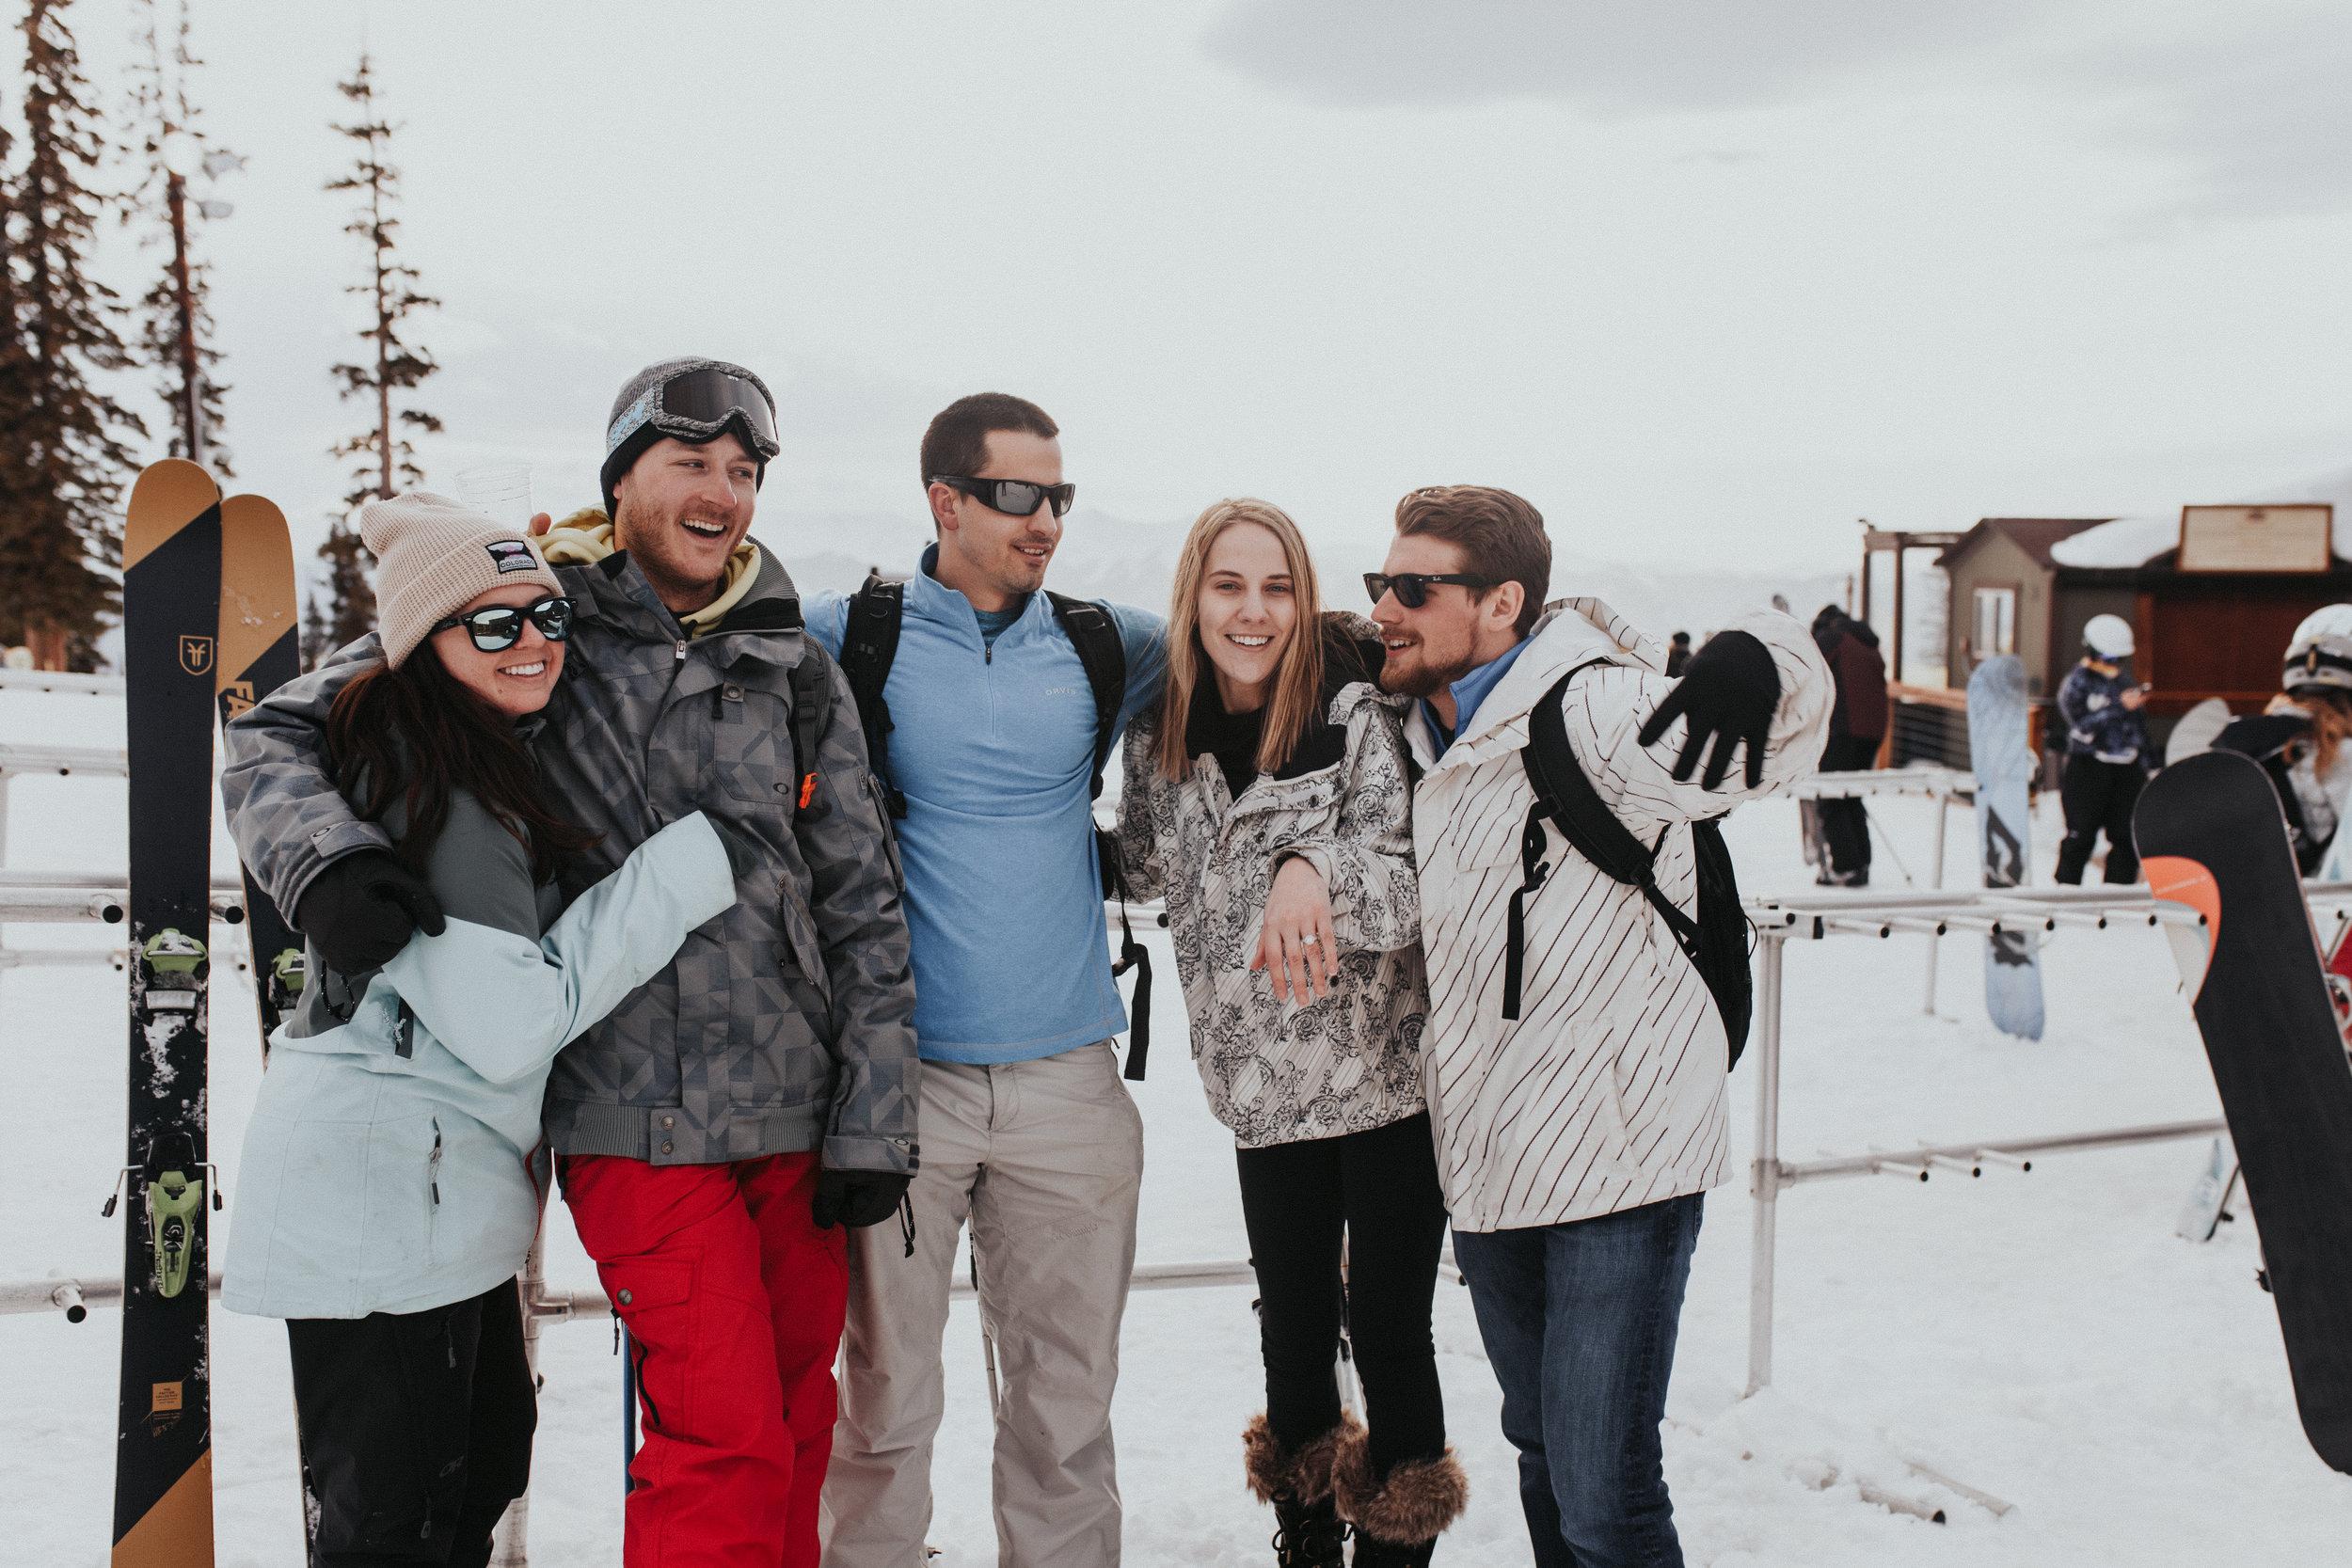 Colorado Rocky Mountain Ski Keystone Engagement Photographer-2.jpg